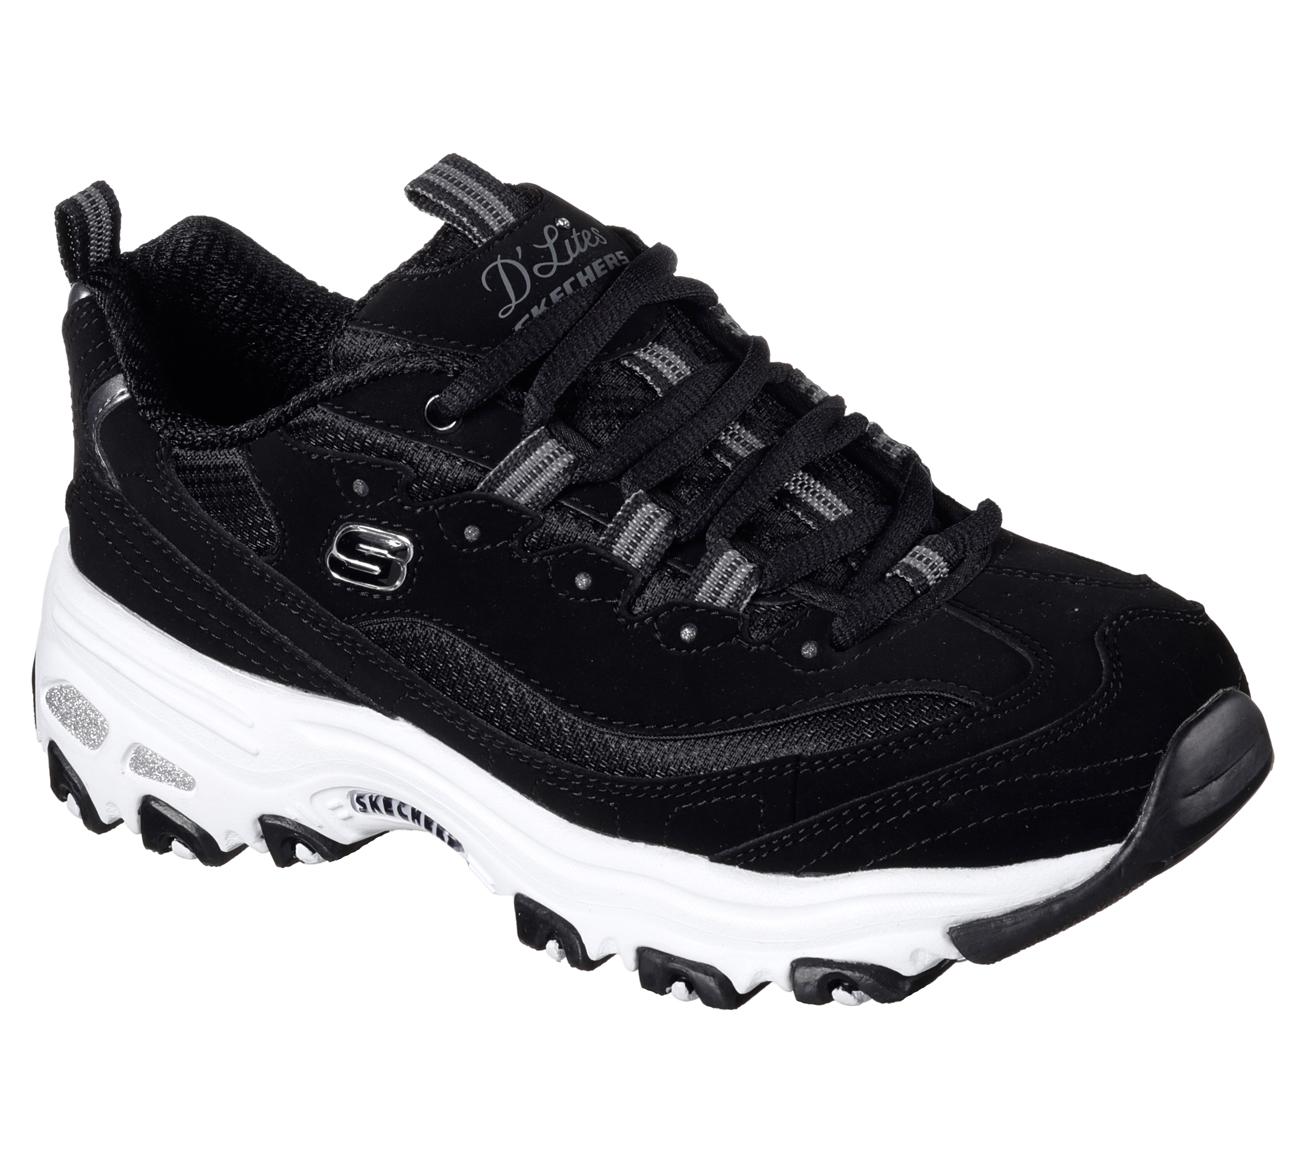 Buy Skechers D Lites Biggest Fan D Lites Shoes Only 65 00